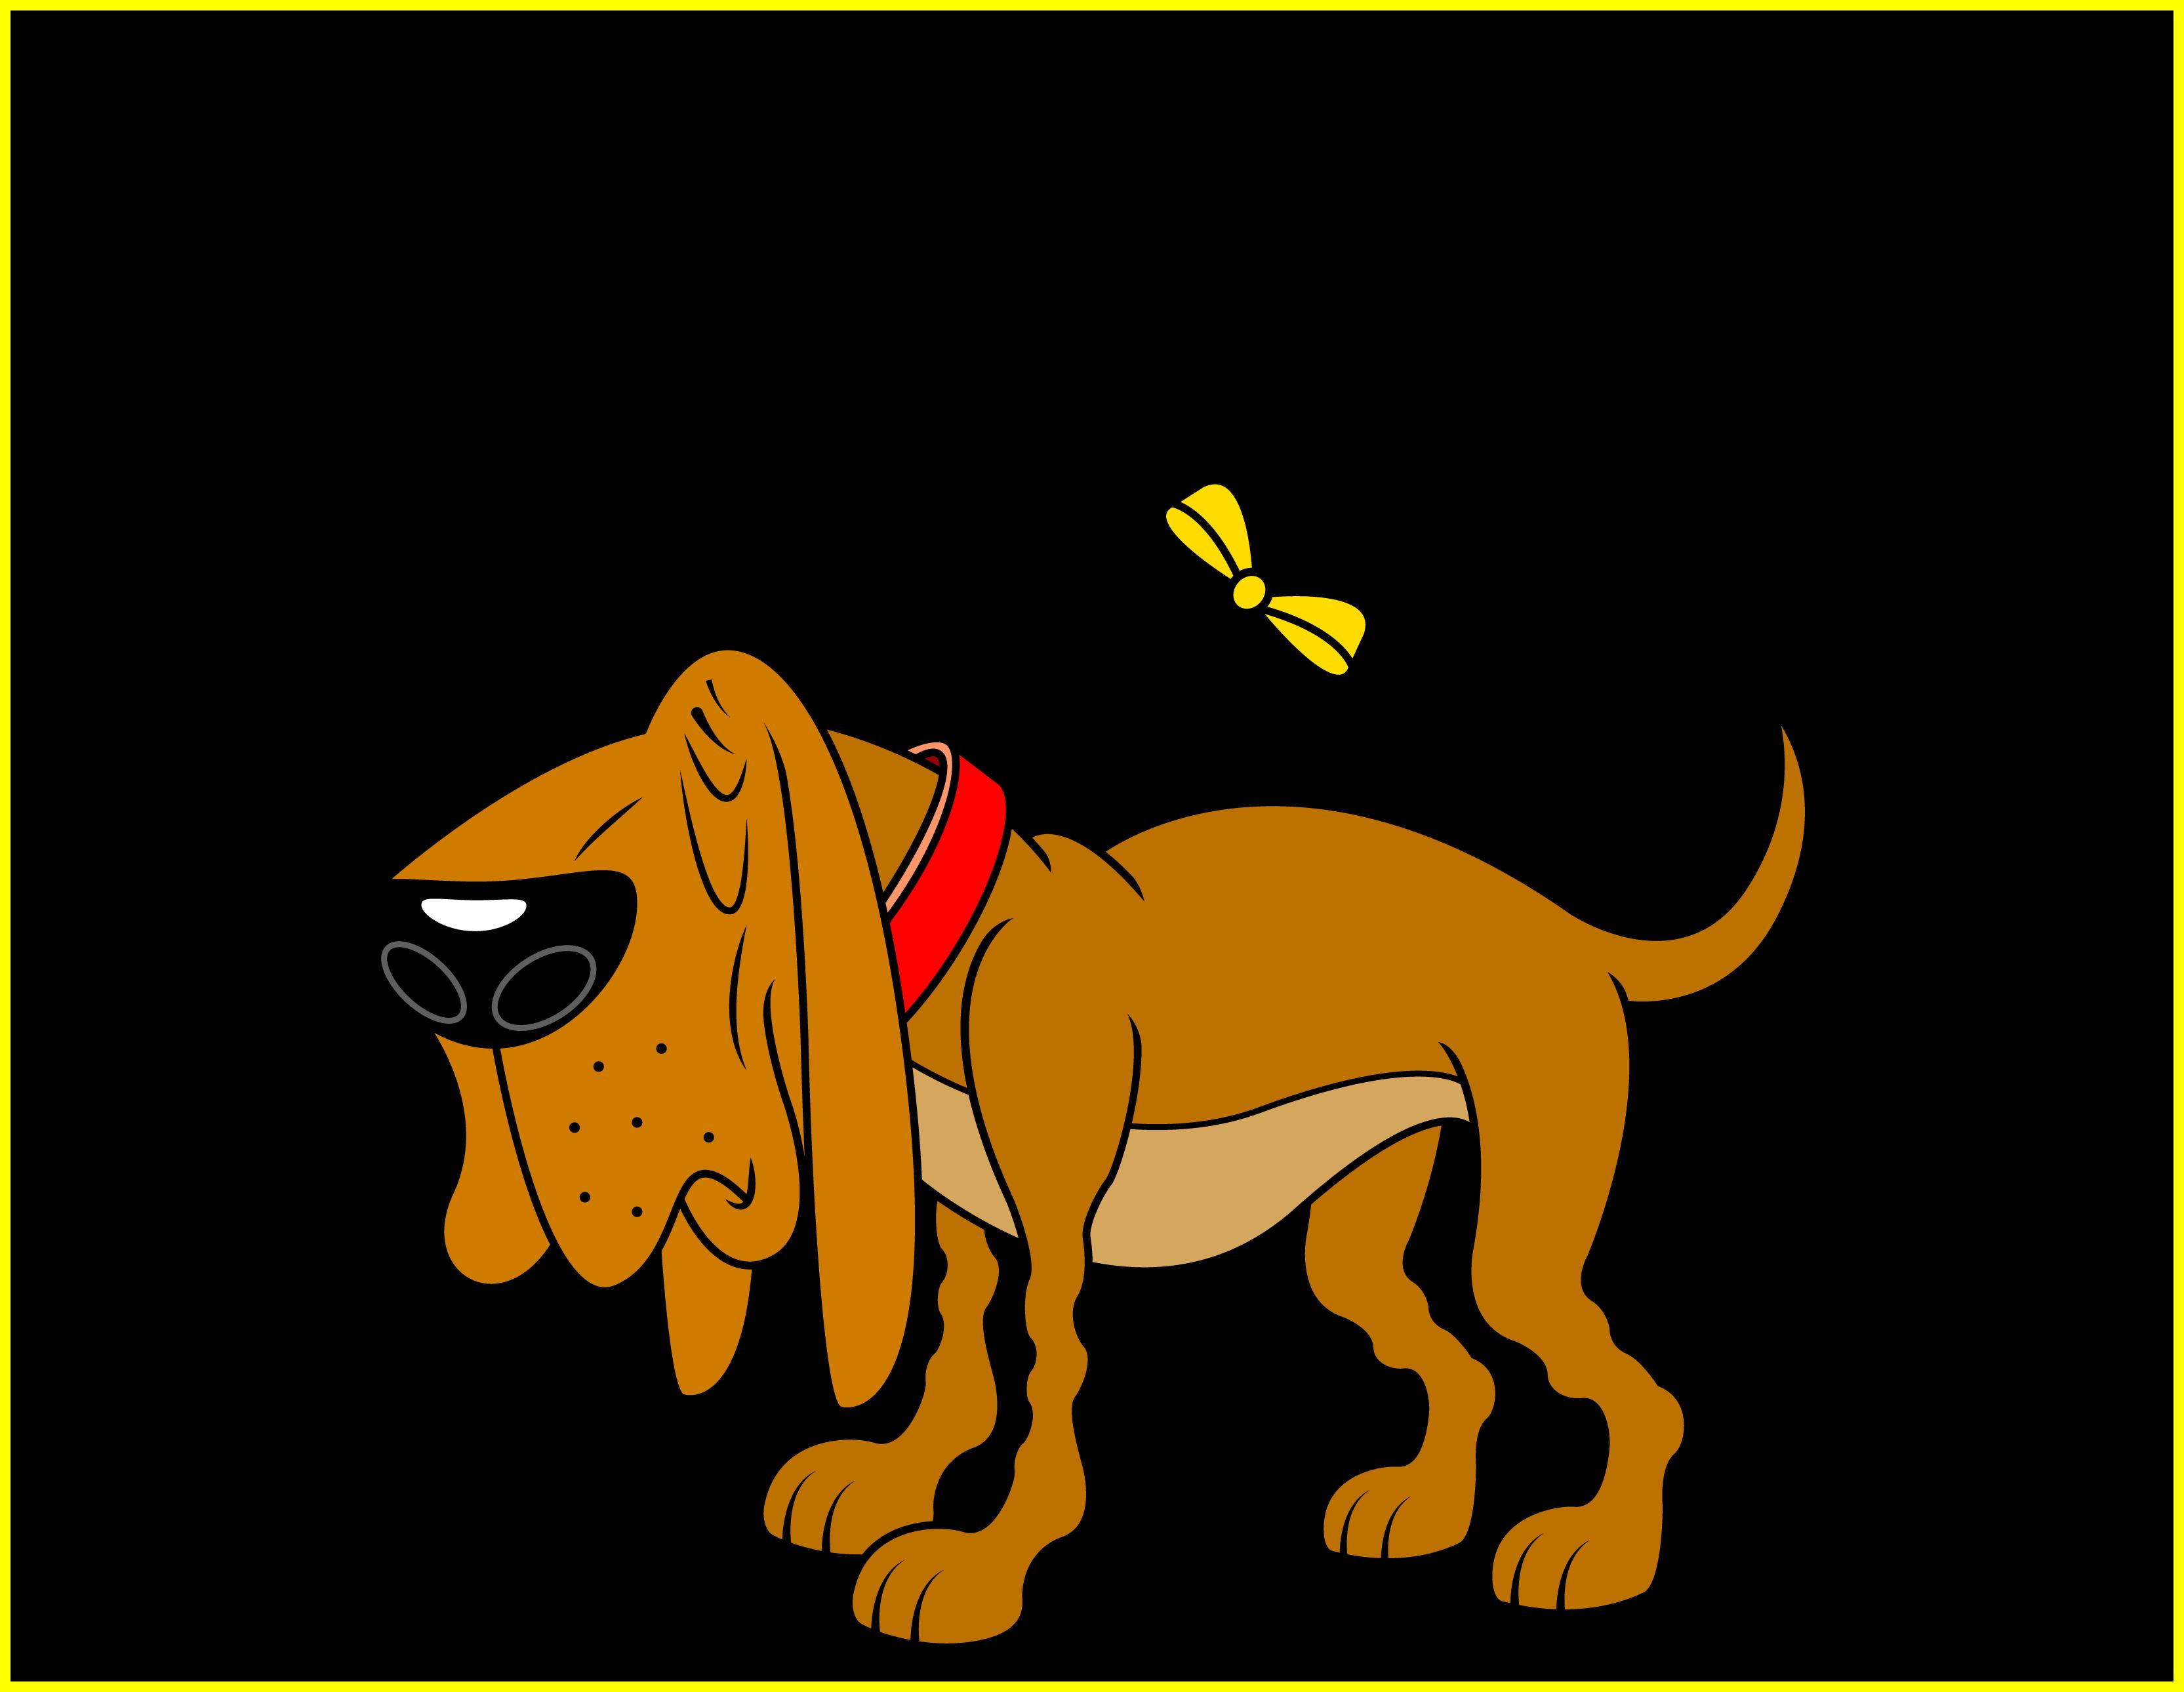 Saint bernard dog clipart clip art library stock Saint Bernard Clipart at GetDrawings.com | Free for personal use ... clip art library stock